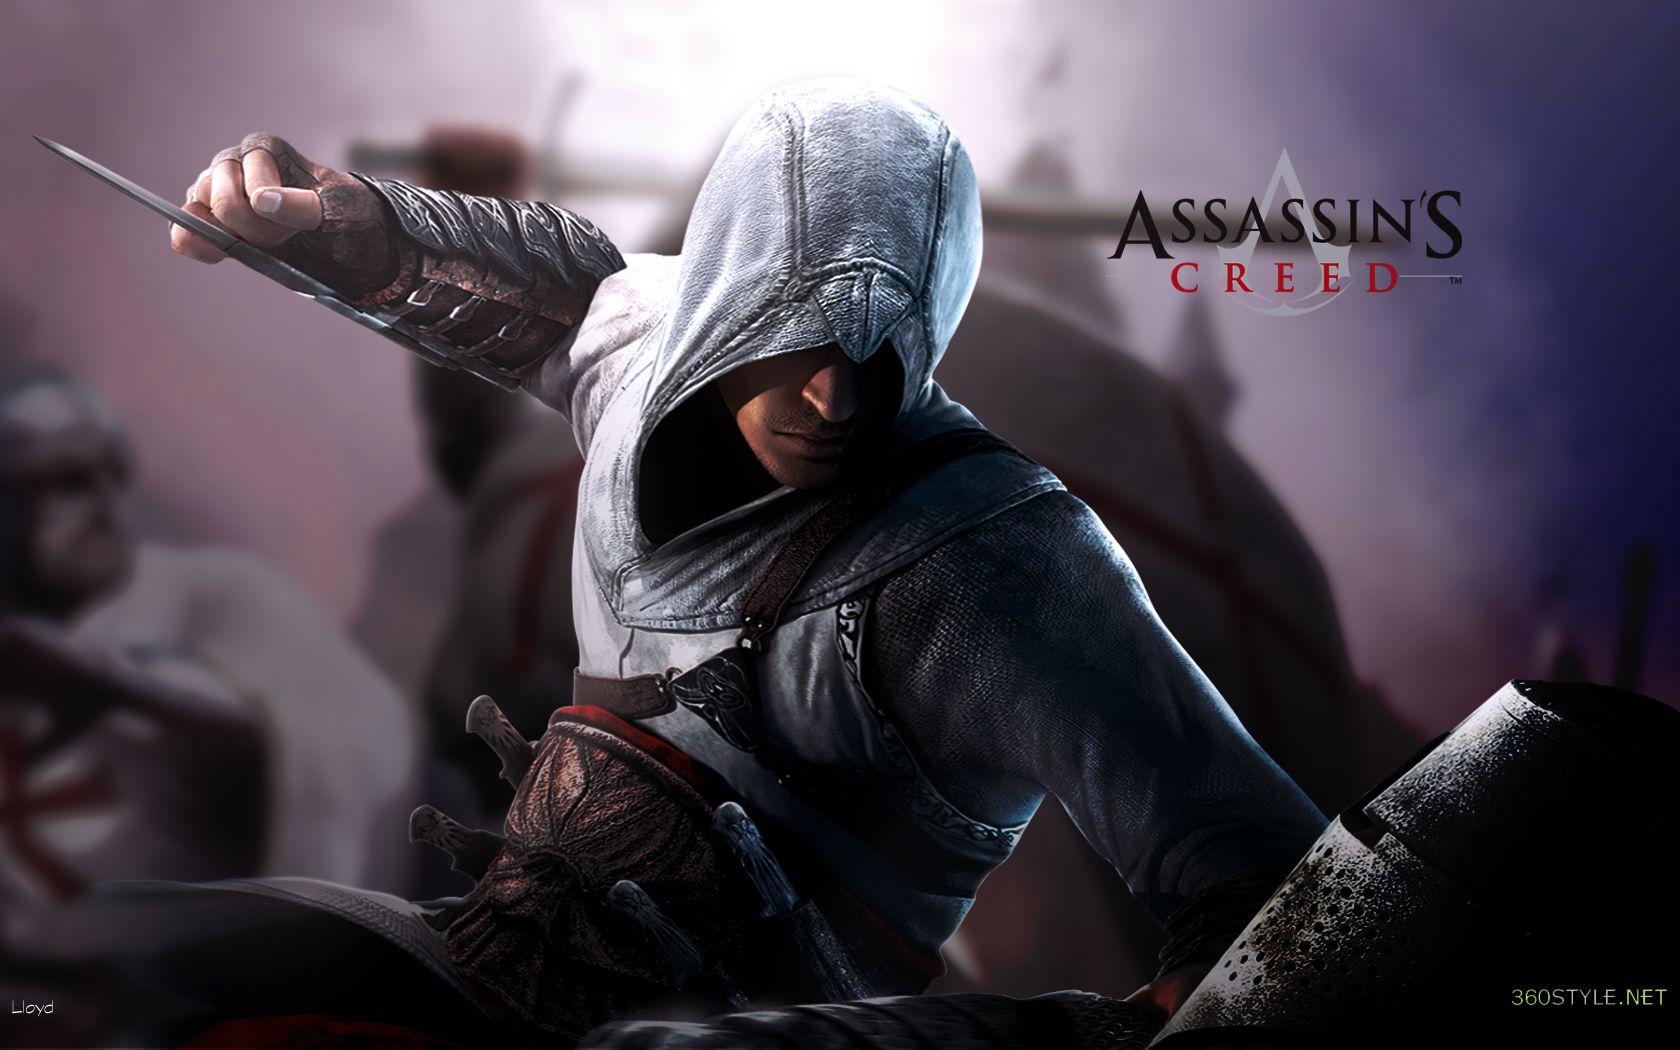 Creed Wallpaper 1680x1050 Assassins Creed Altair Assassination 1680x1050